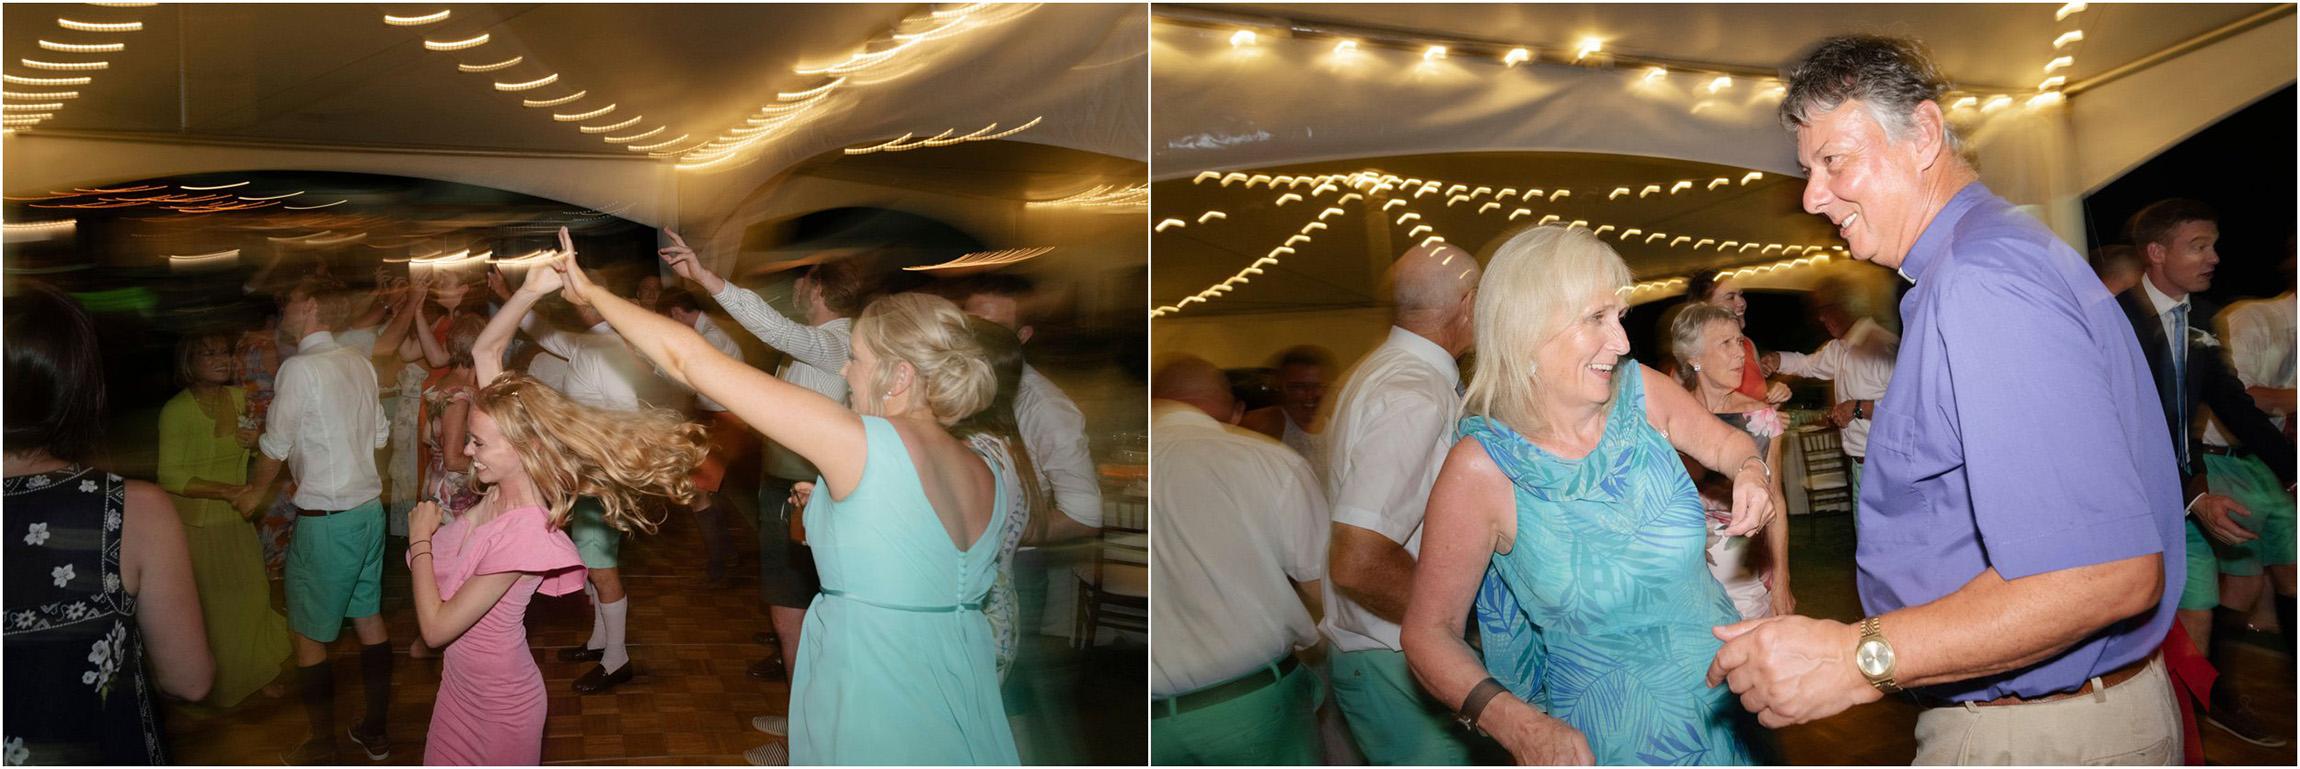 ©FianderFoto_Bermuda Wedding Photographer_Mid Ocean_Rachel_Angus_123.jpg